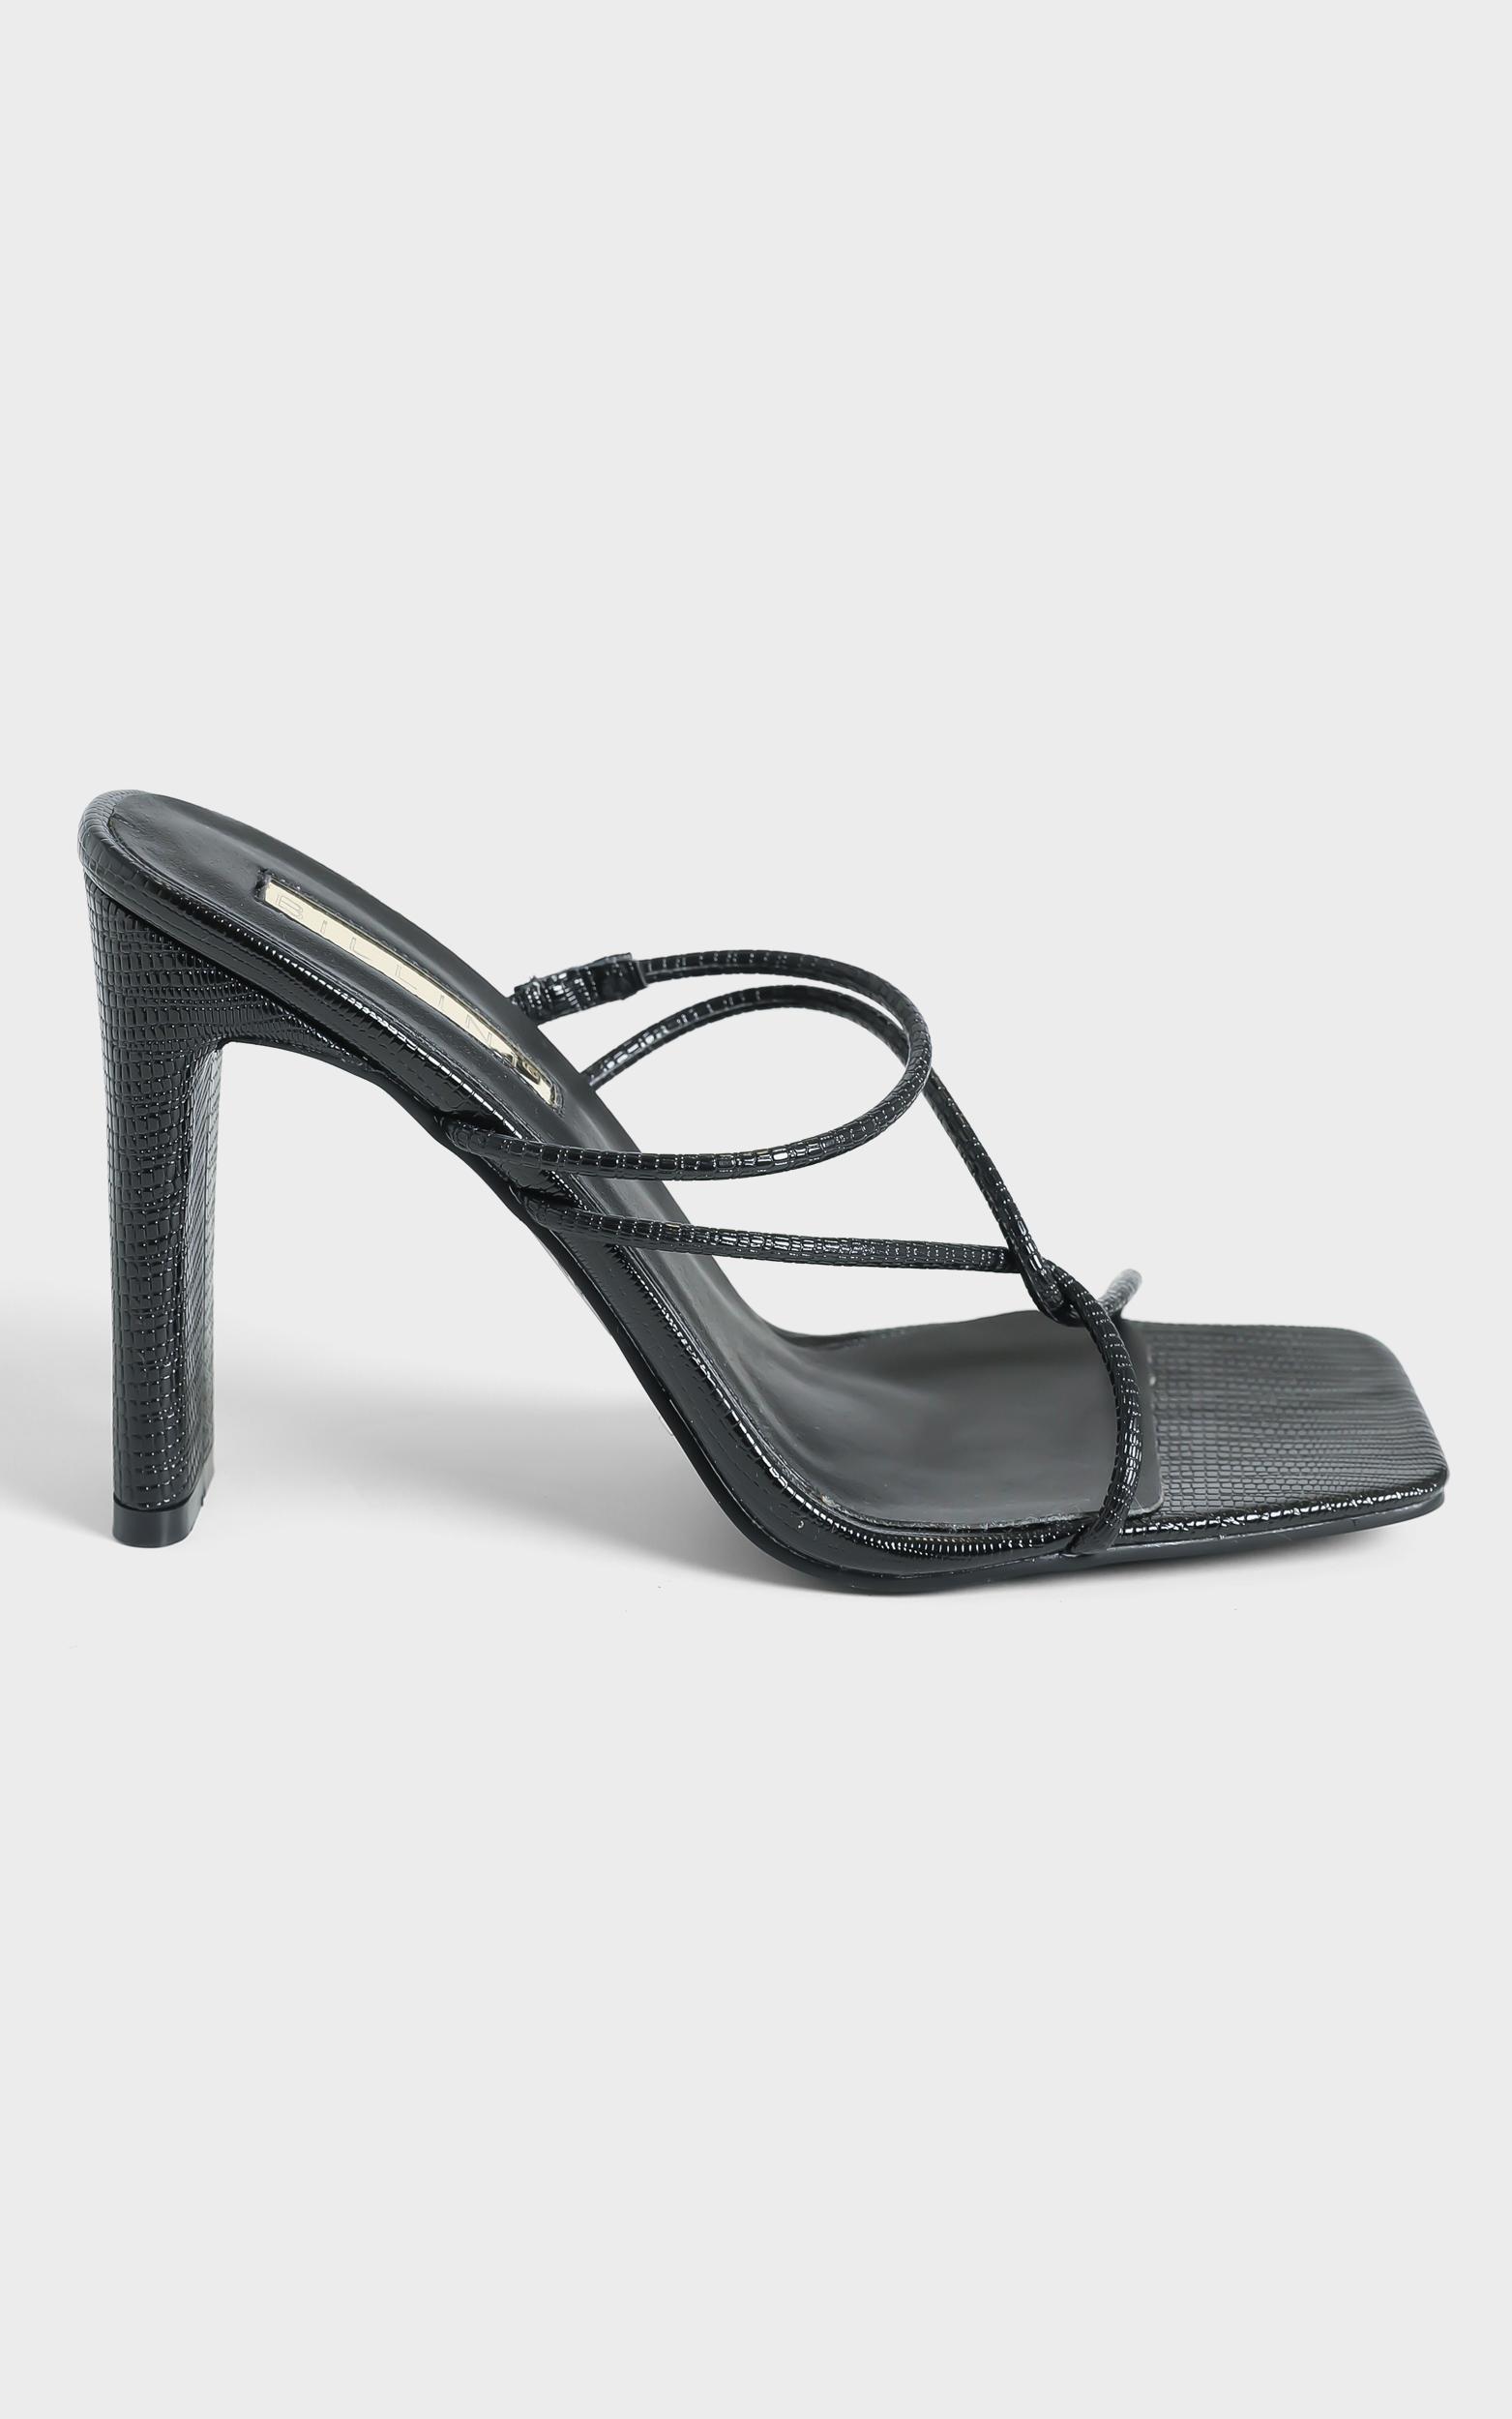 Billini - Emmah Heels in Black Scale - 05, BLK1, hi-res image number null